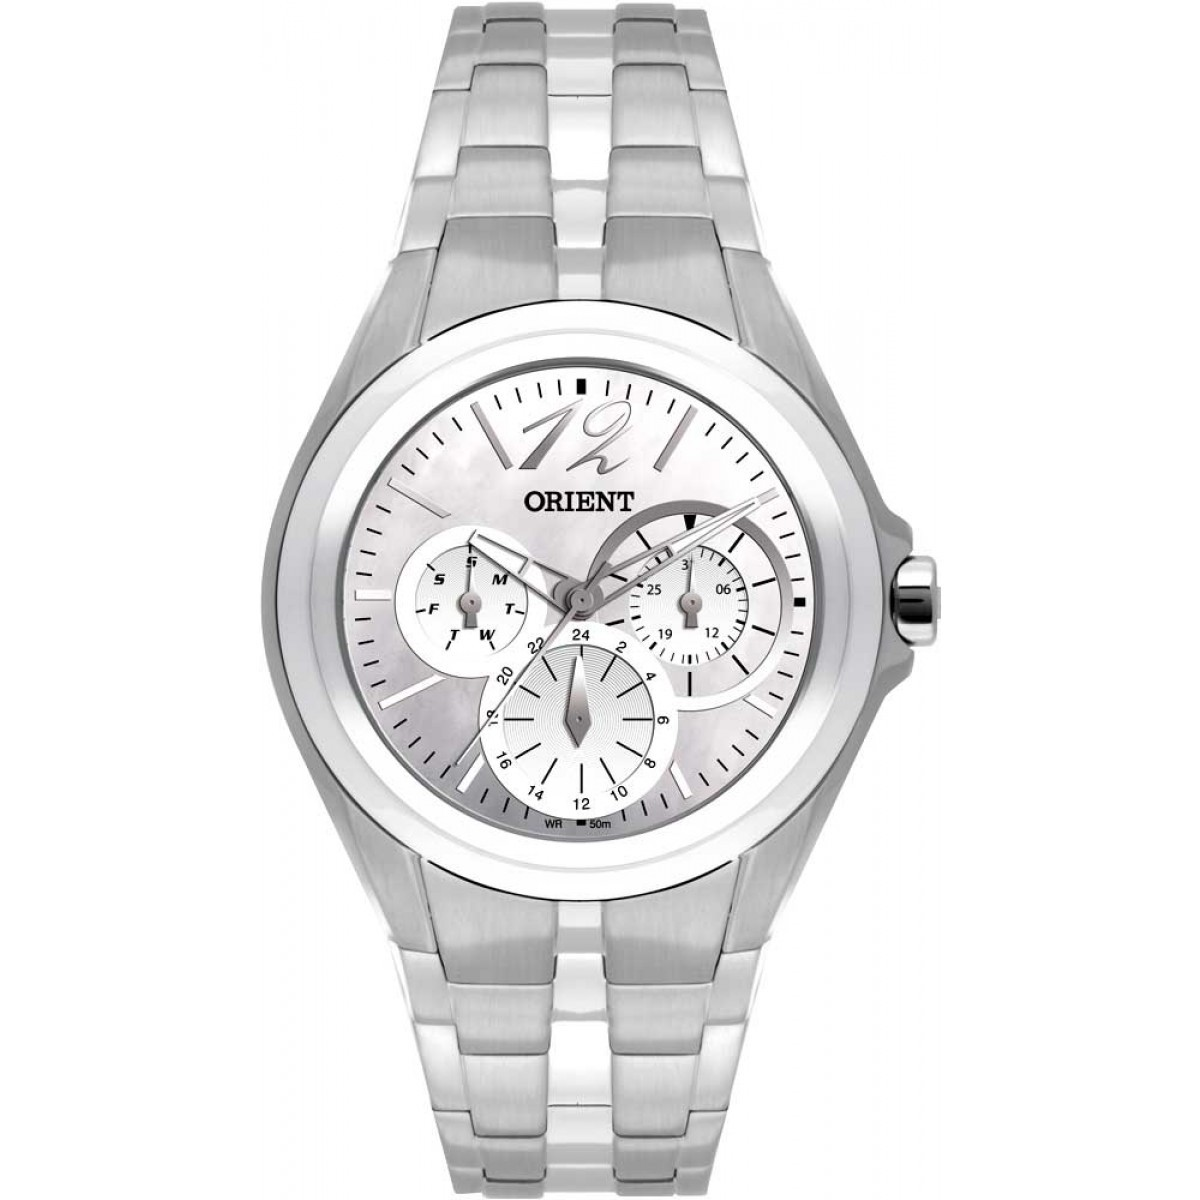 Relógio Orient Feminino - FBSSM018 B2SX  - Dumont Online - Joias e Relógios